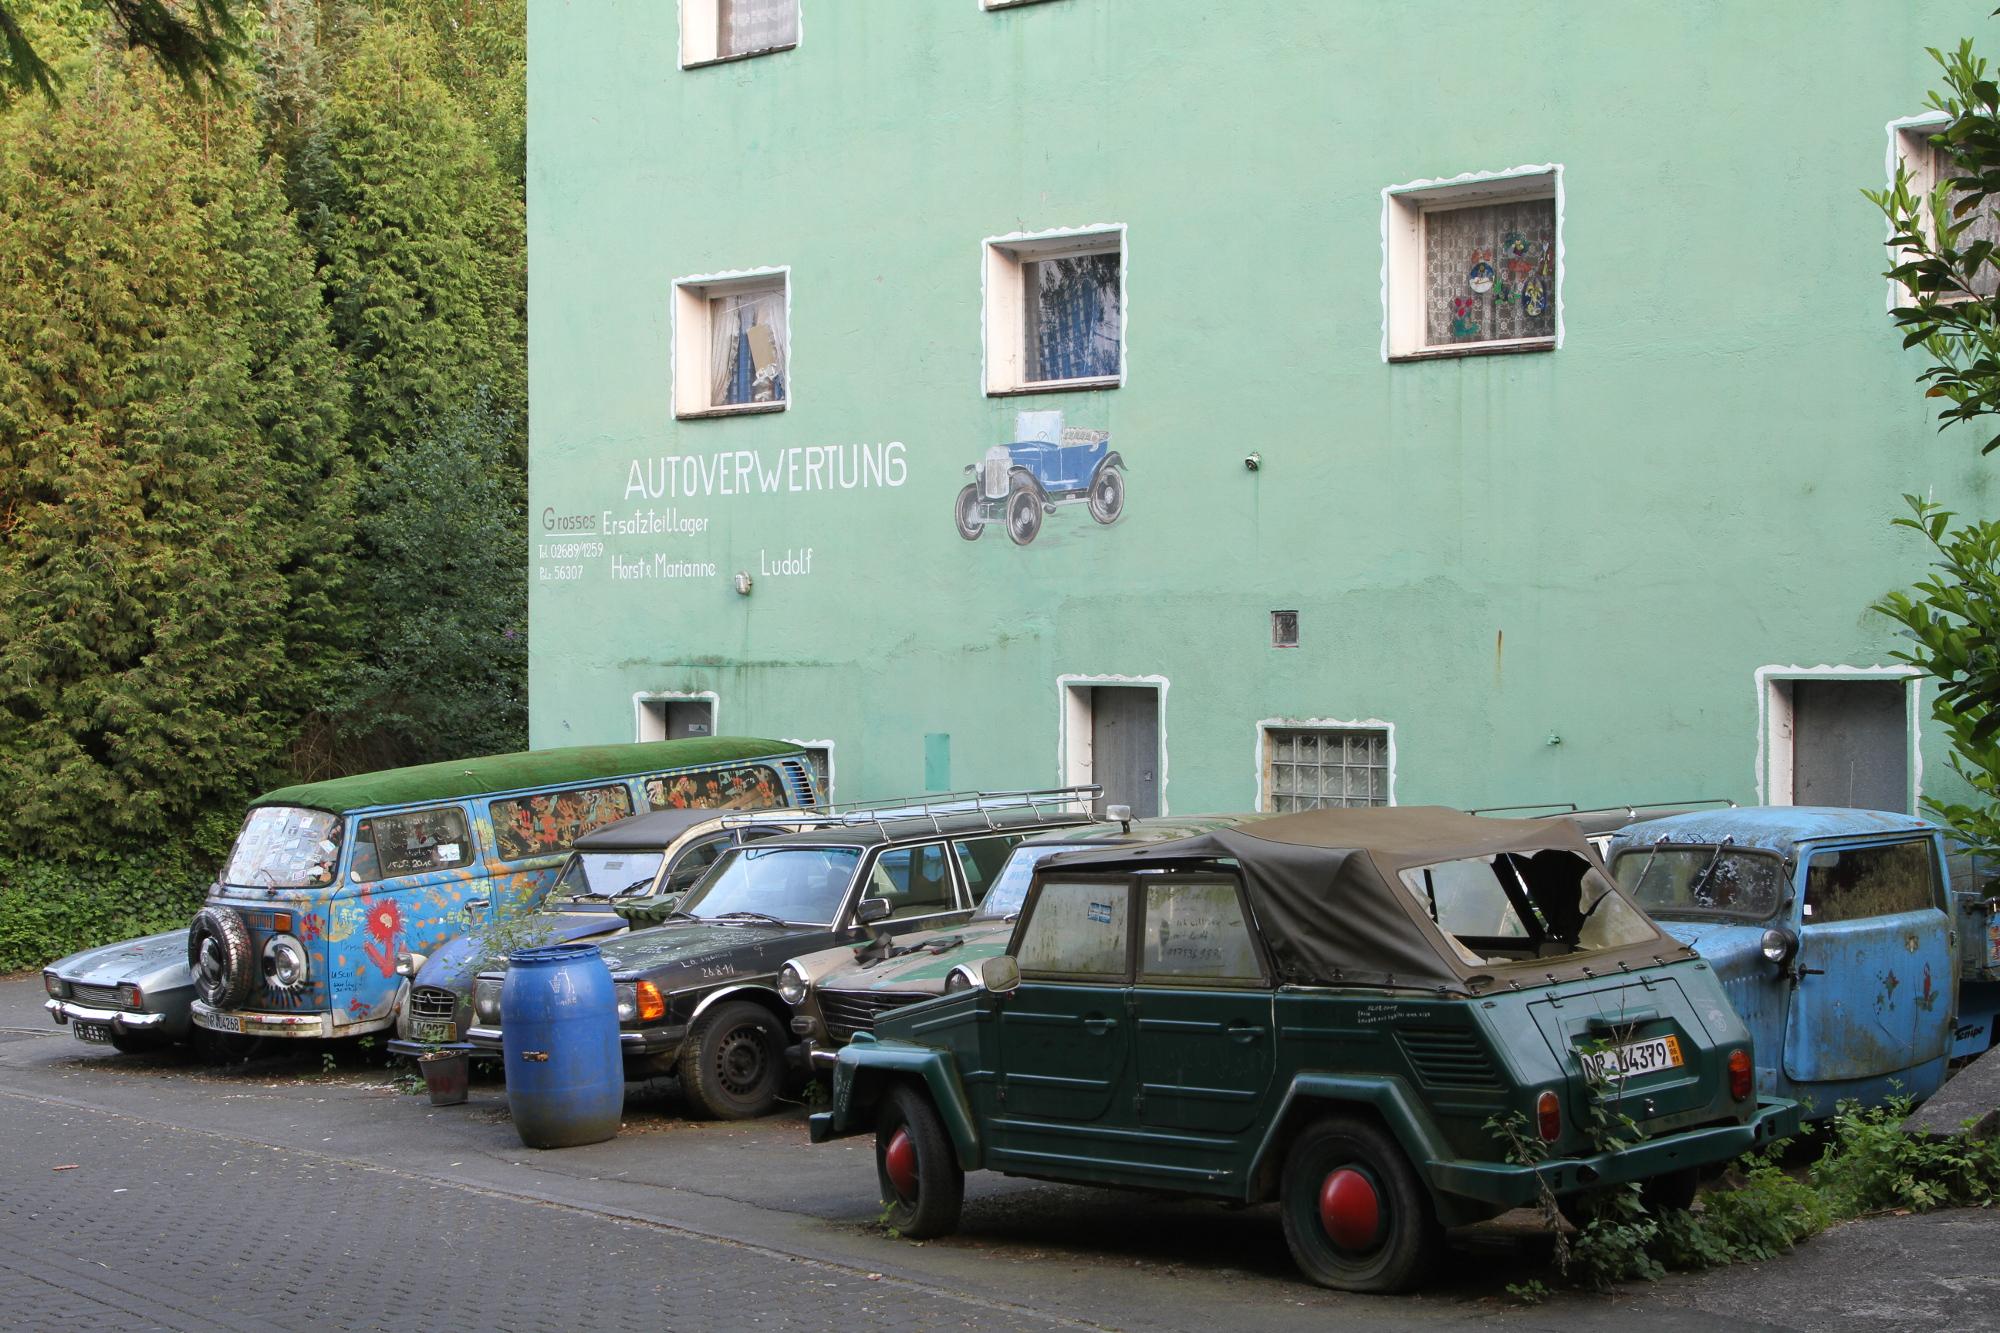 File:Autoverwertung Ludolf in Dernbach.JPG - Wikimedia Commons